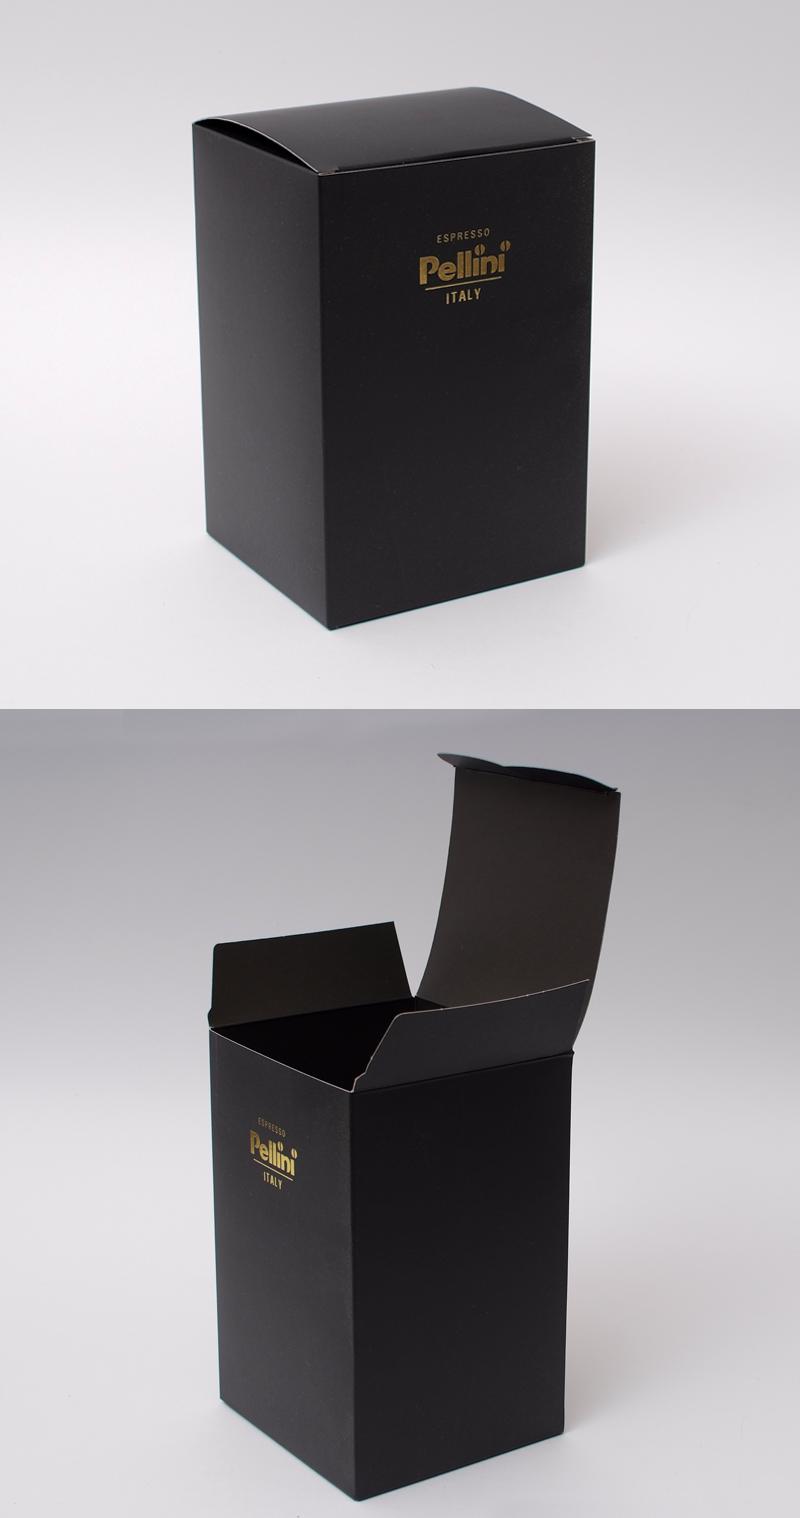 Pellini 패키지 모아패키지 패키지샘플 package 스타일